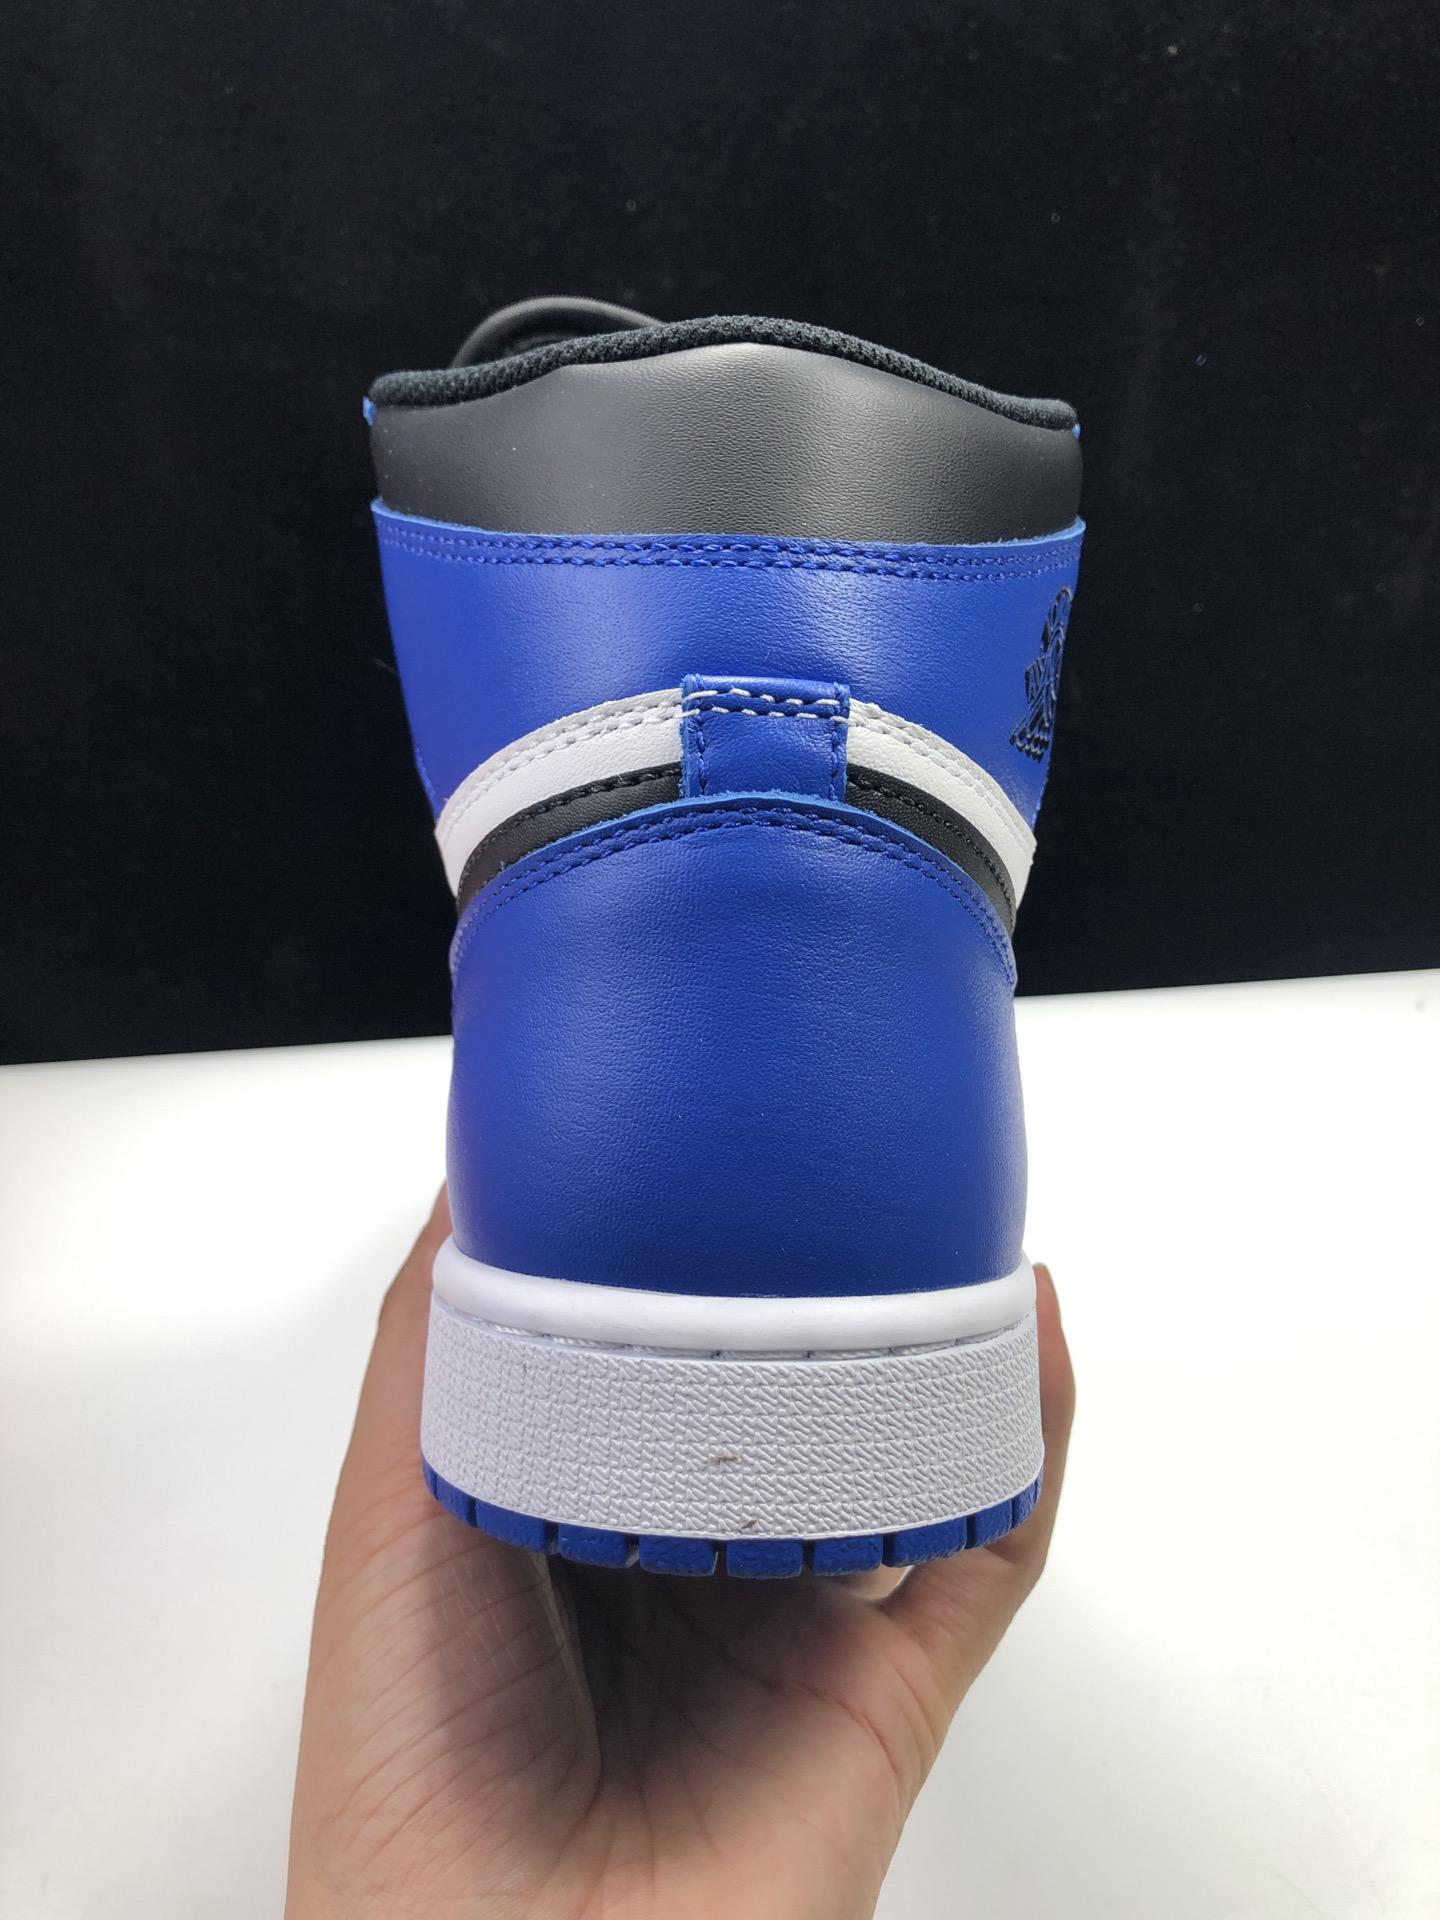 【S2版:AJ1】 小闪电   莞产 Air Jordan 1 Retro High OG,货号:555088-403_ljr版本测评